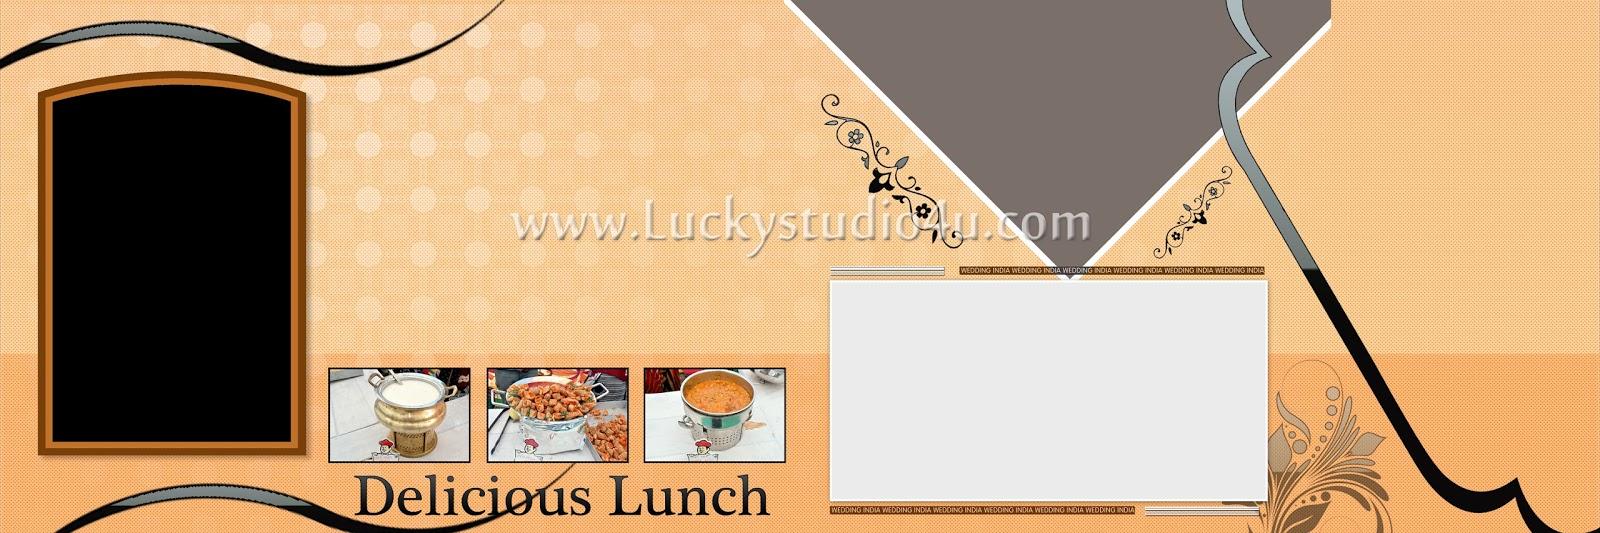 Album Design Templates PSD Free Download - Luckystudio4u